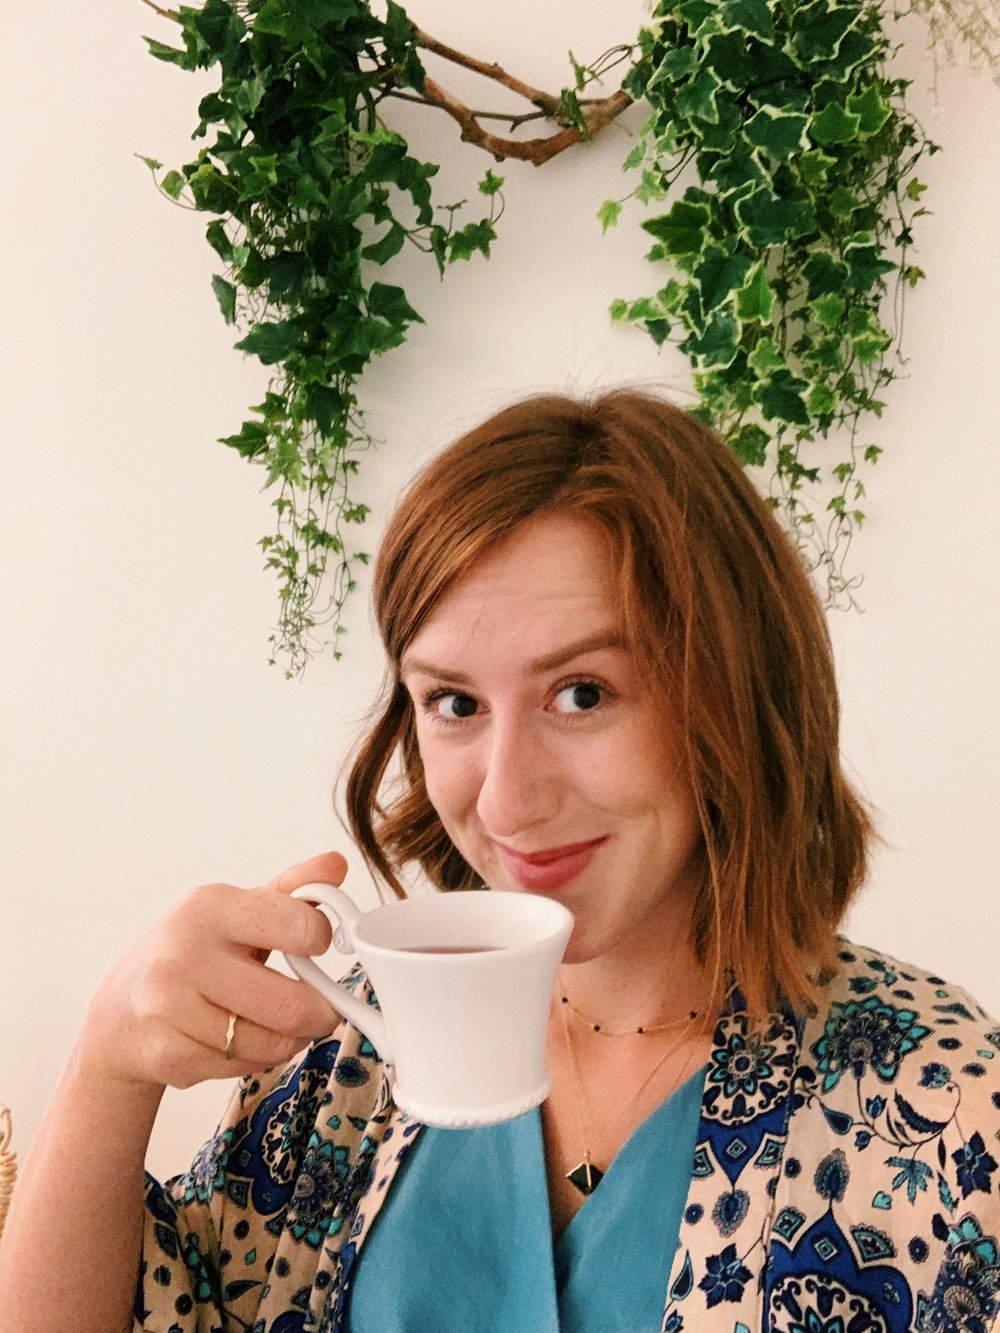 Feeling smug with my herbal tea in Bat Your Lash Salon.